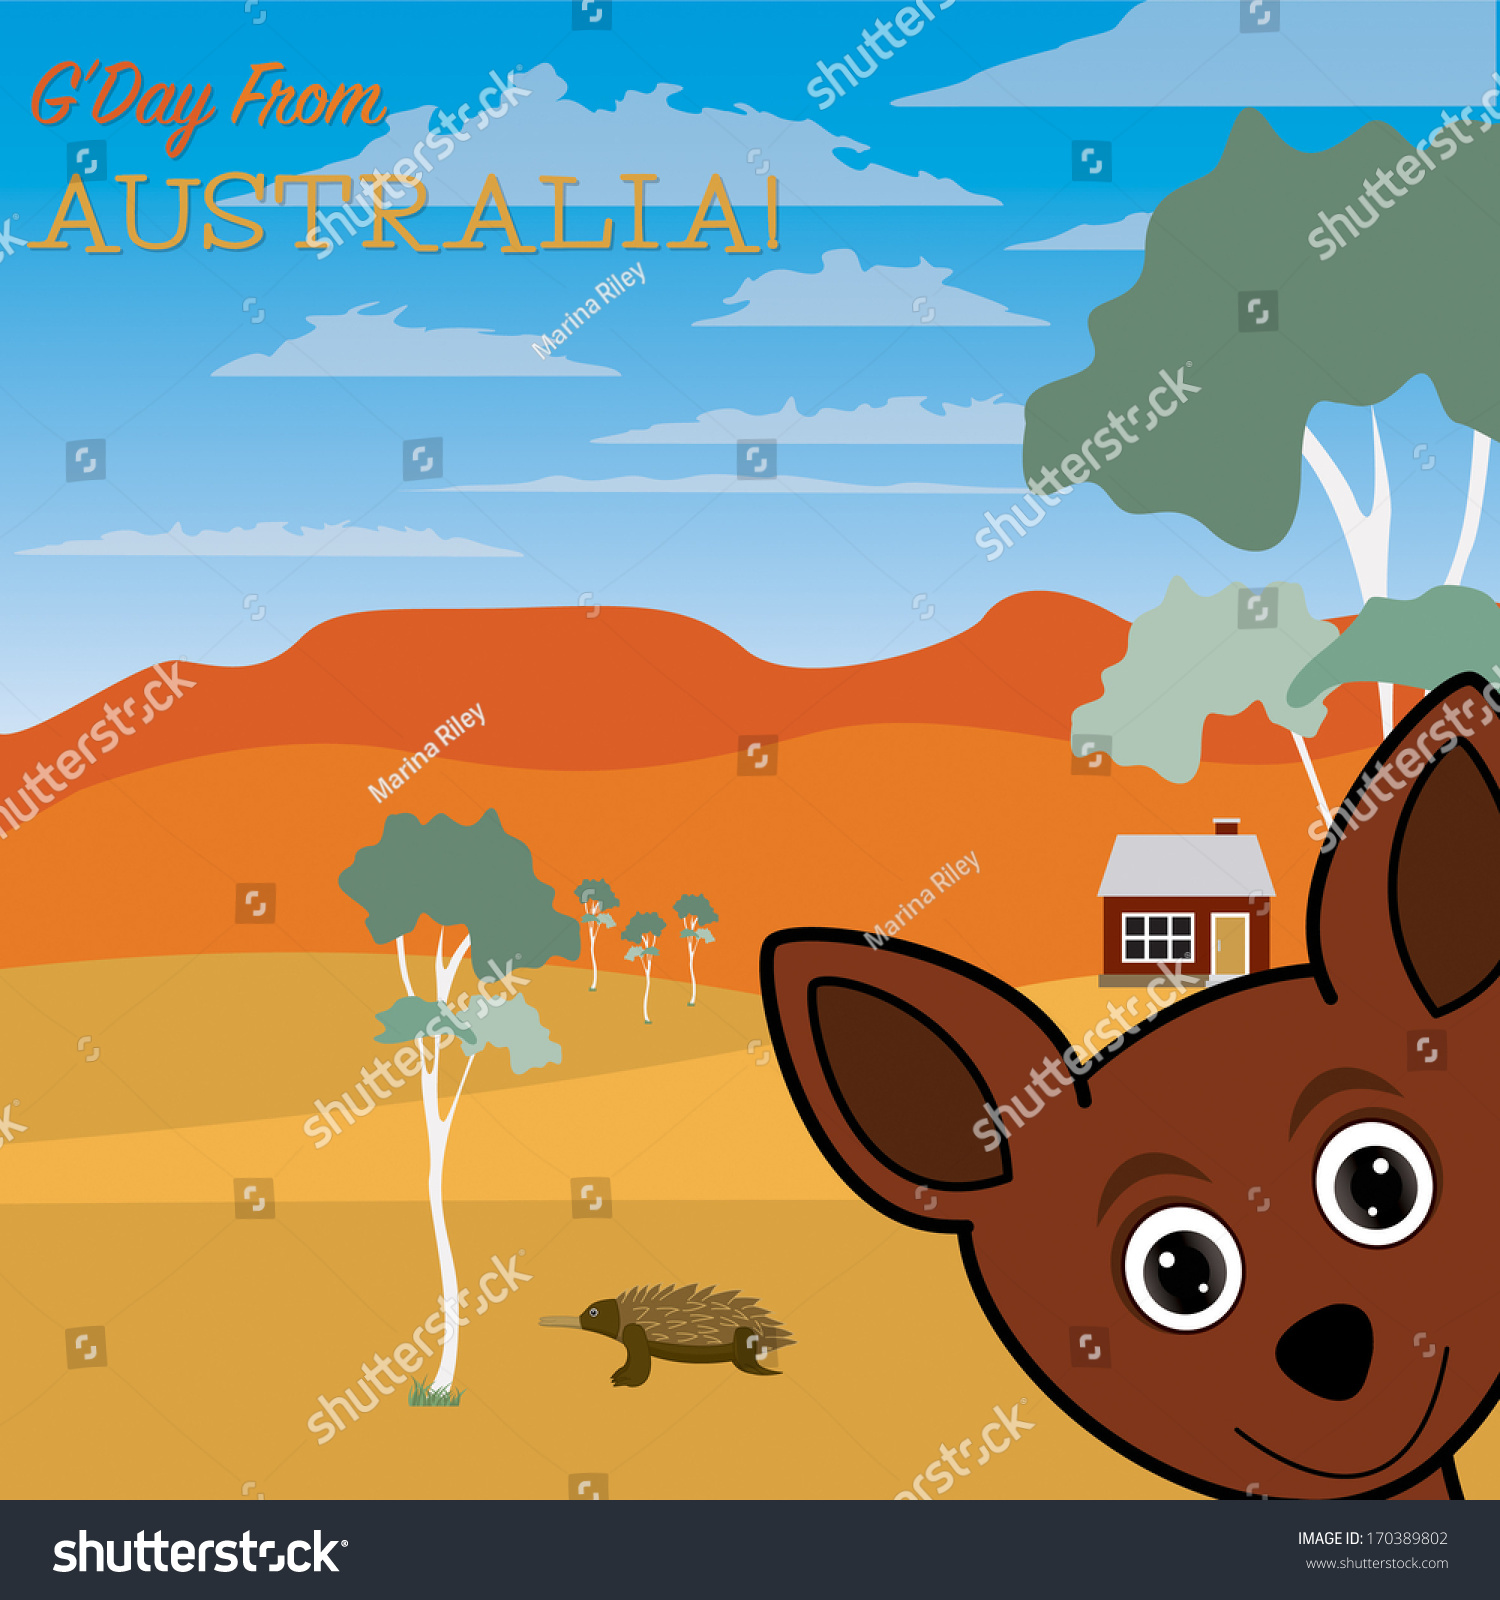 Gday australia greeting card vector format stock vector 170389802 gday from australia greeting card in vector format kristyandbryce Gallery